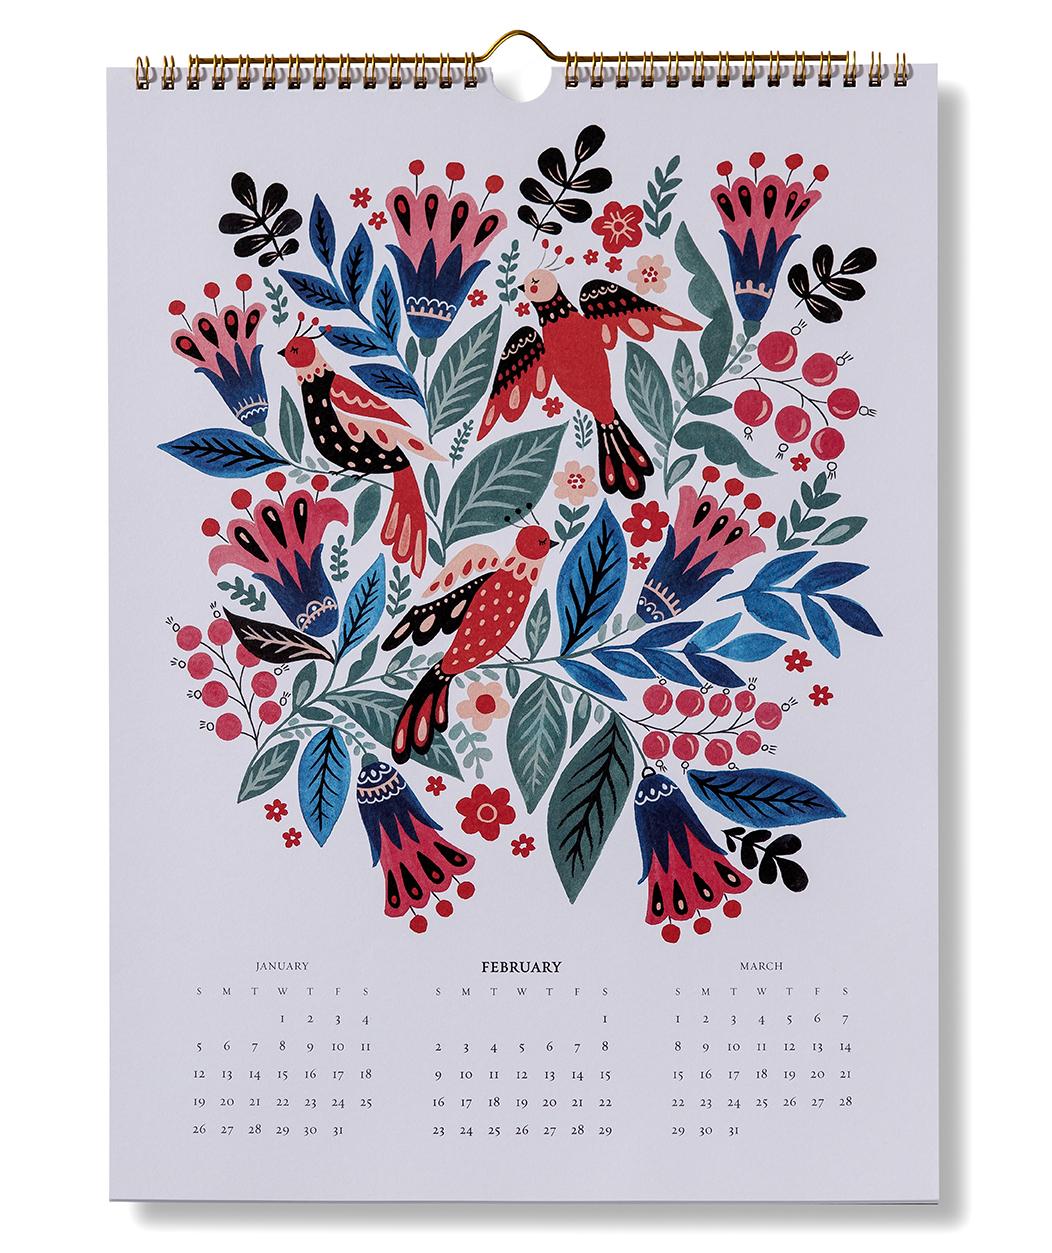 High_Note_Dinara_Mirtalipova_Wall_Calendar2.jpg